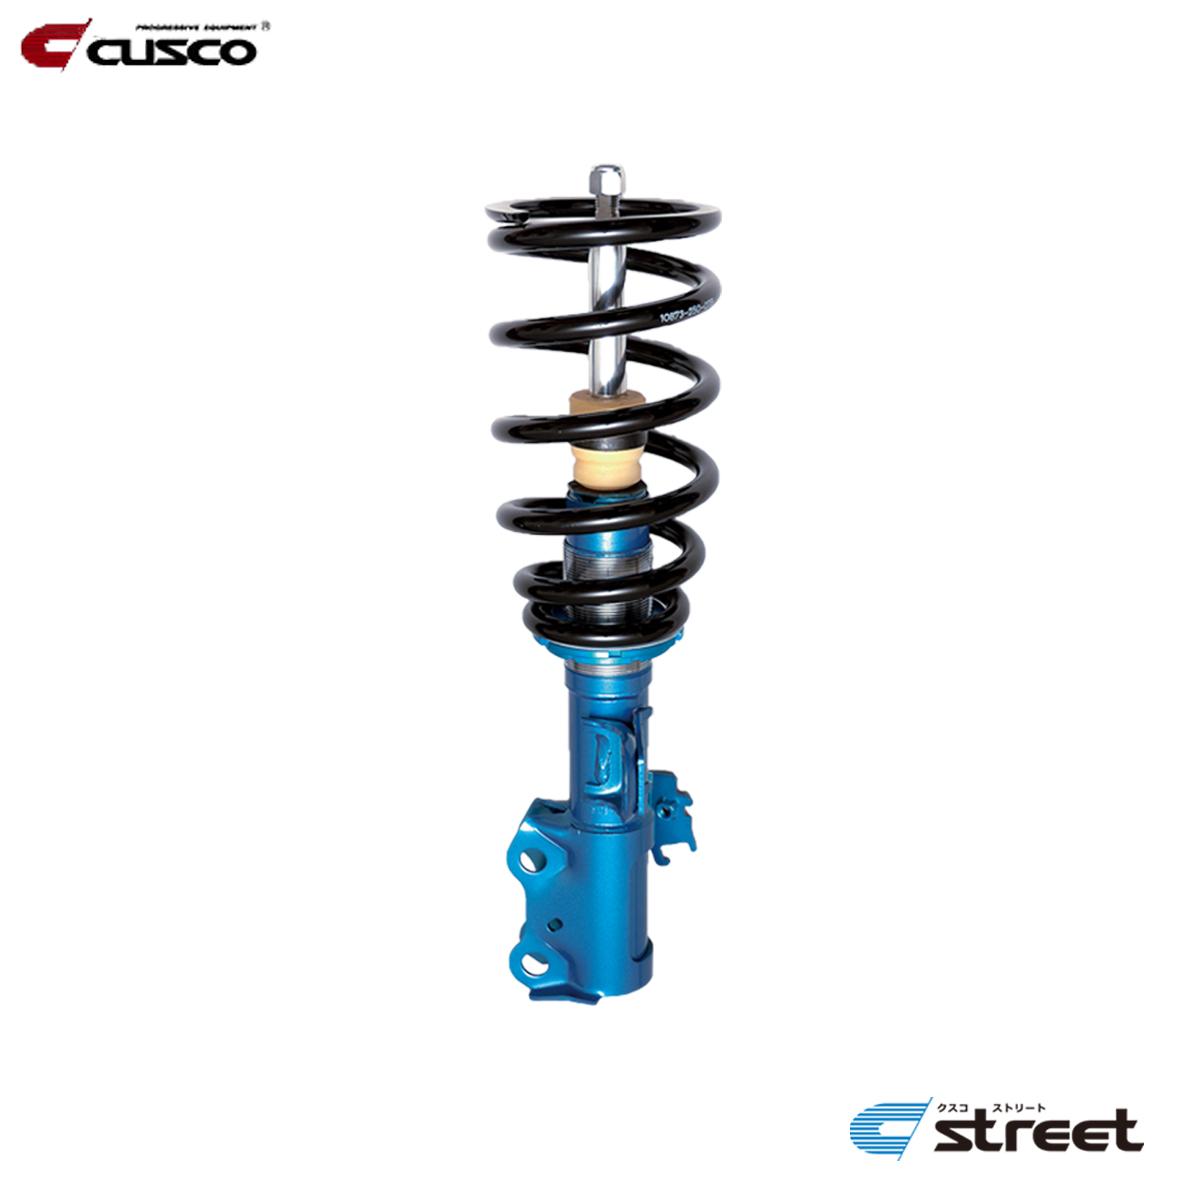 CUSCO クスコ モコ MG21S 車高調 全長固定式 613-62K-CBA ストリートA STREET A